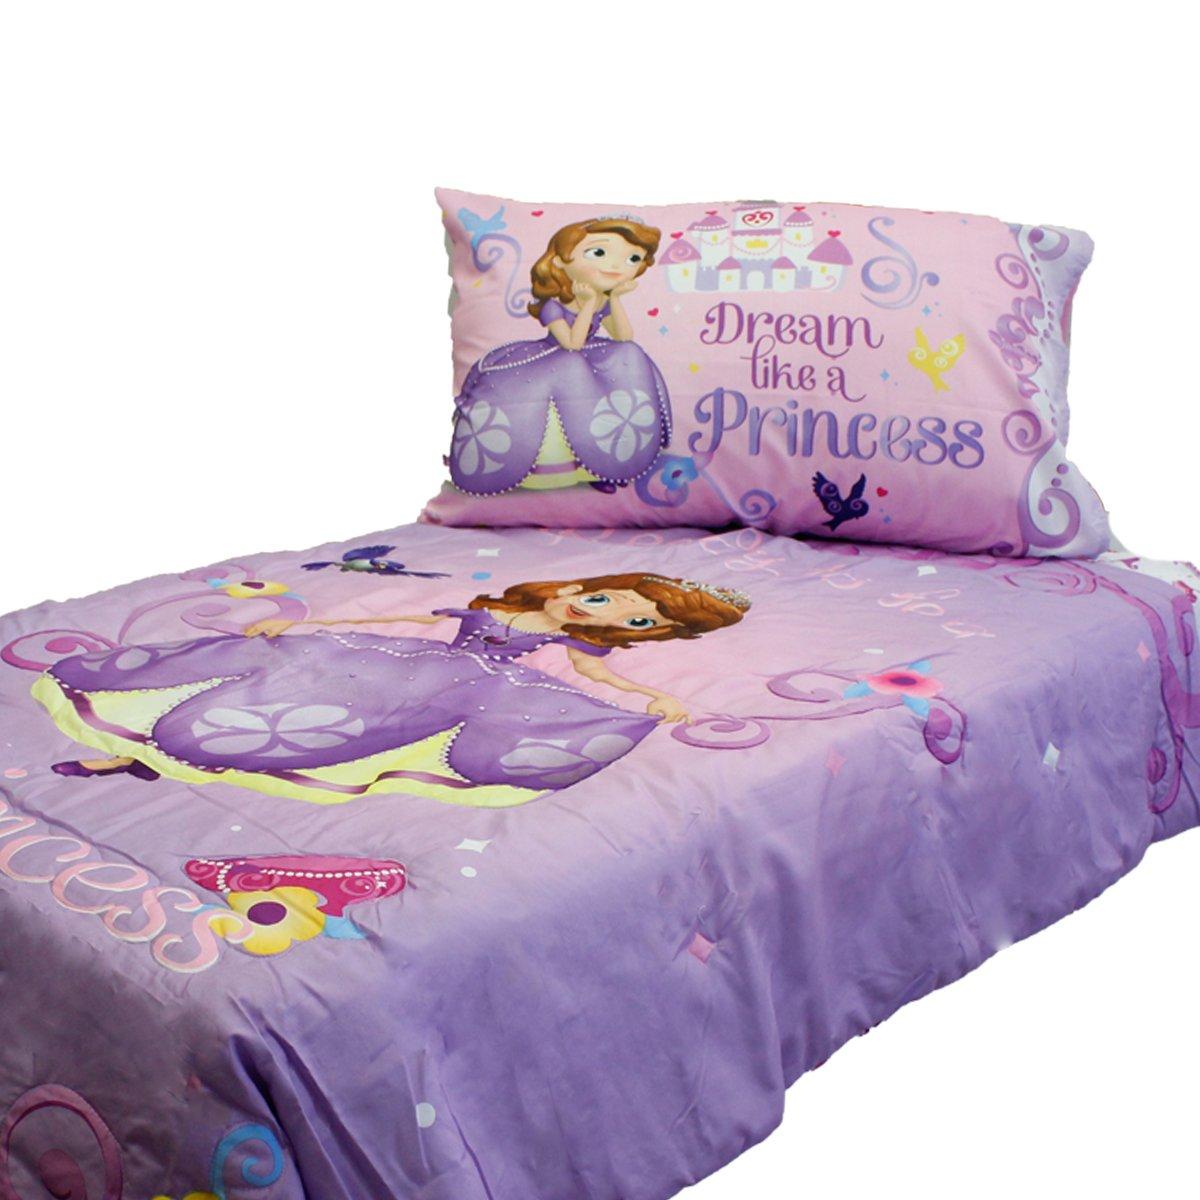 Disney princess toddler bedding 4 piece set - Amazon Com Sofia First Princess Scrolls 4 Piece Toddler Bedding Set Baby